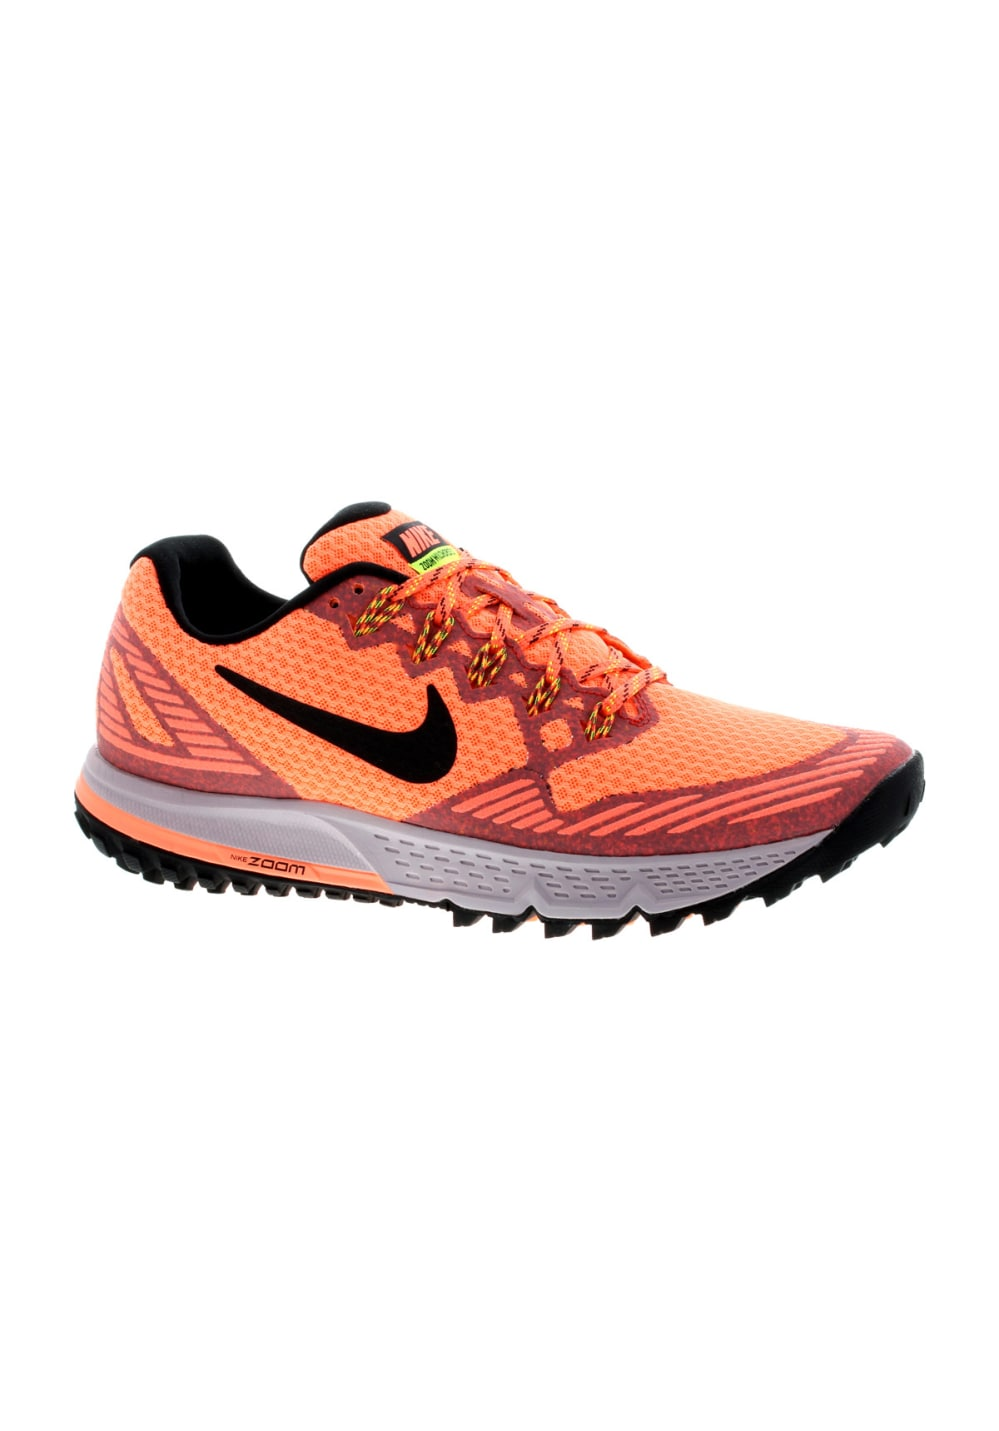 half off 7d301 79626 Next. -60%. Nike. Air Zoom Wildhorse 3 ...